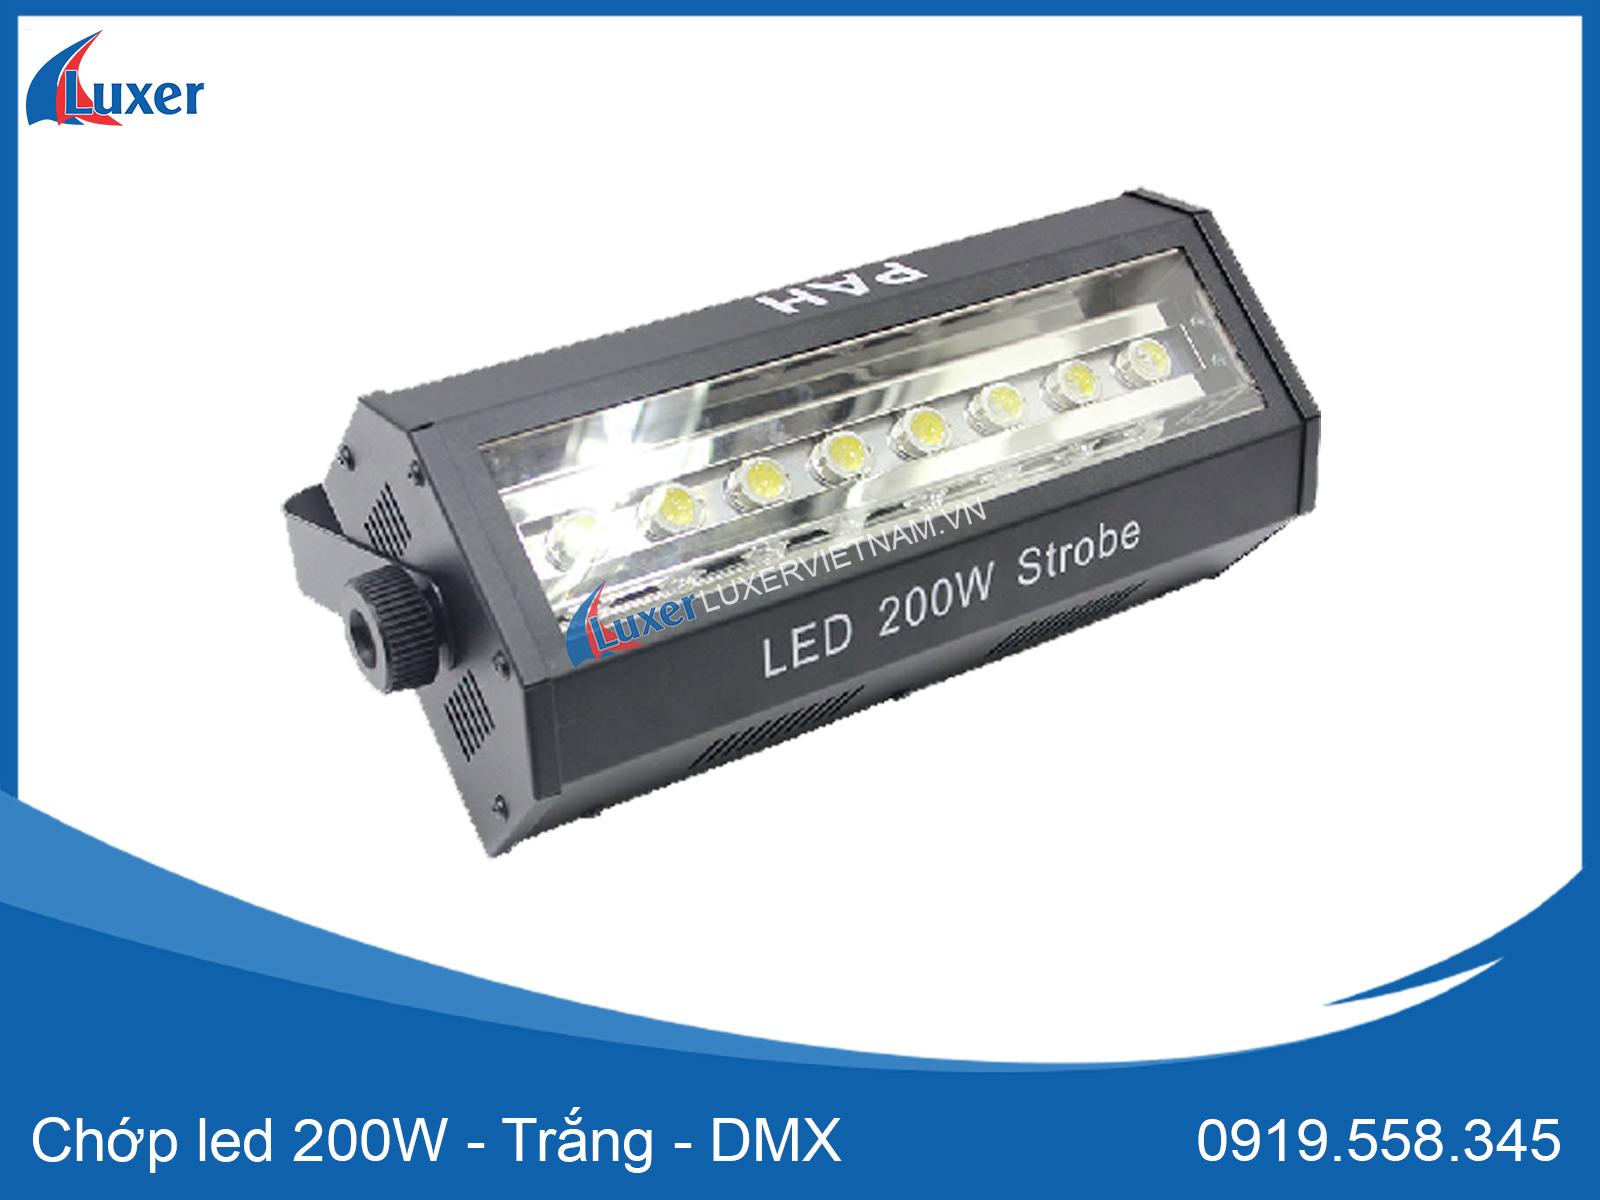 Chớp led 200W - Trắng - DMX